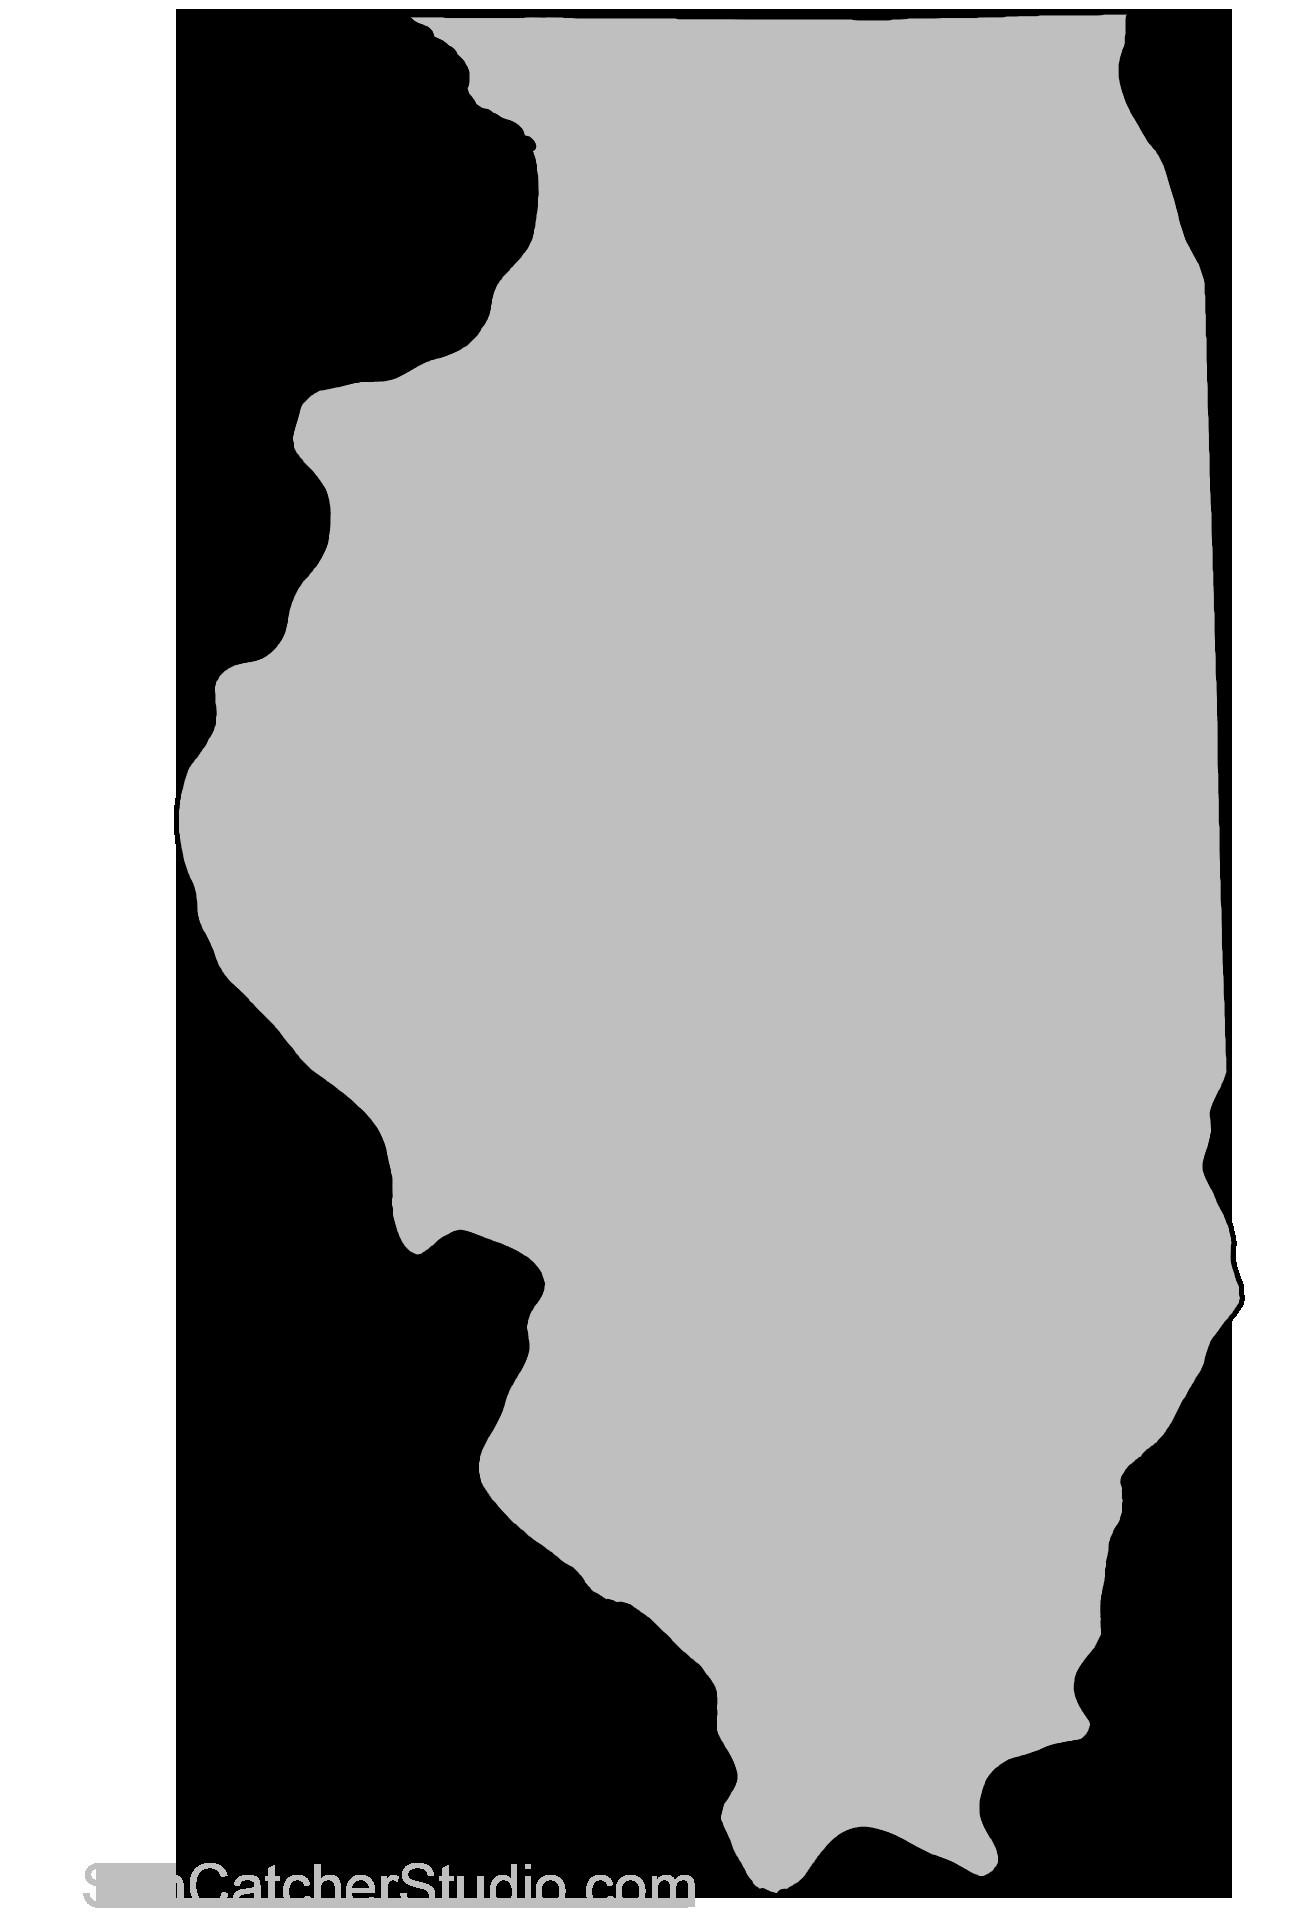 1316x1930 Us Map Clipart Transpatent Us Map Vector Dromibi Top Clip Art New